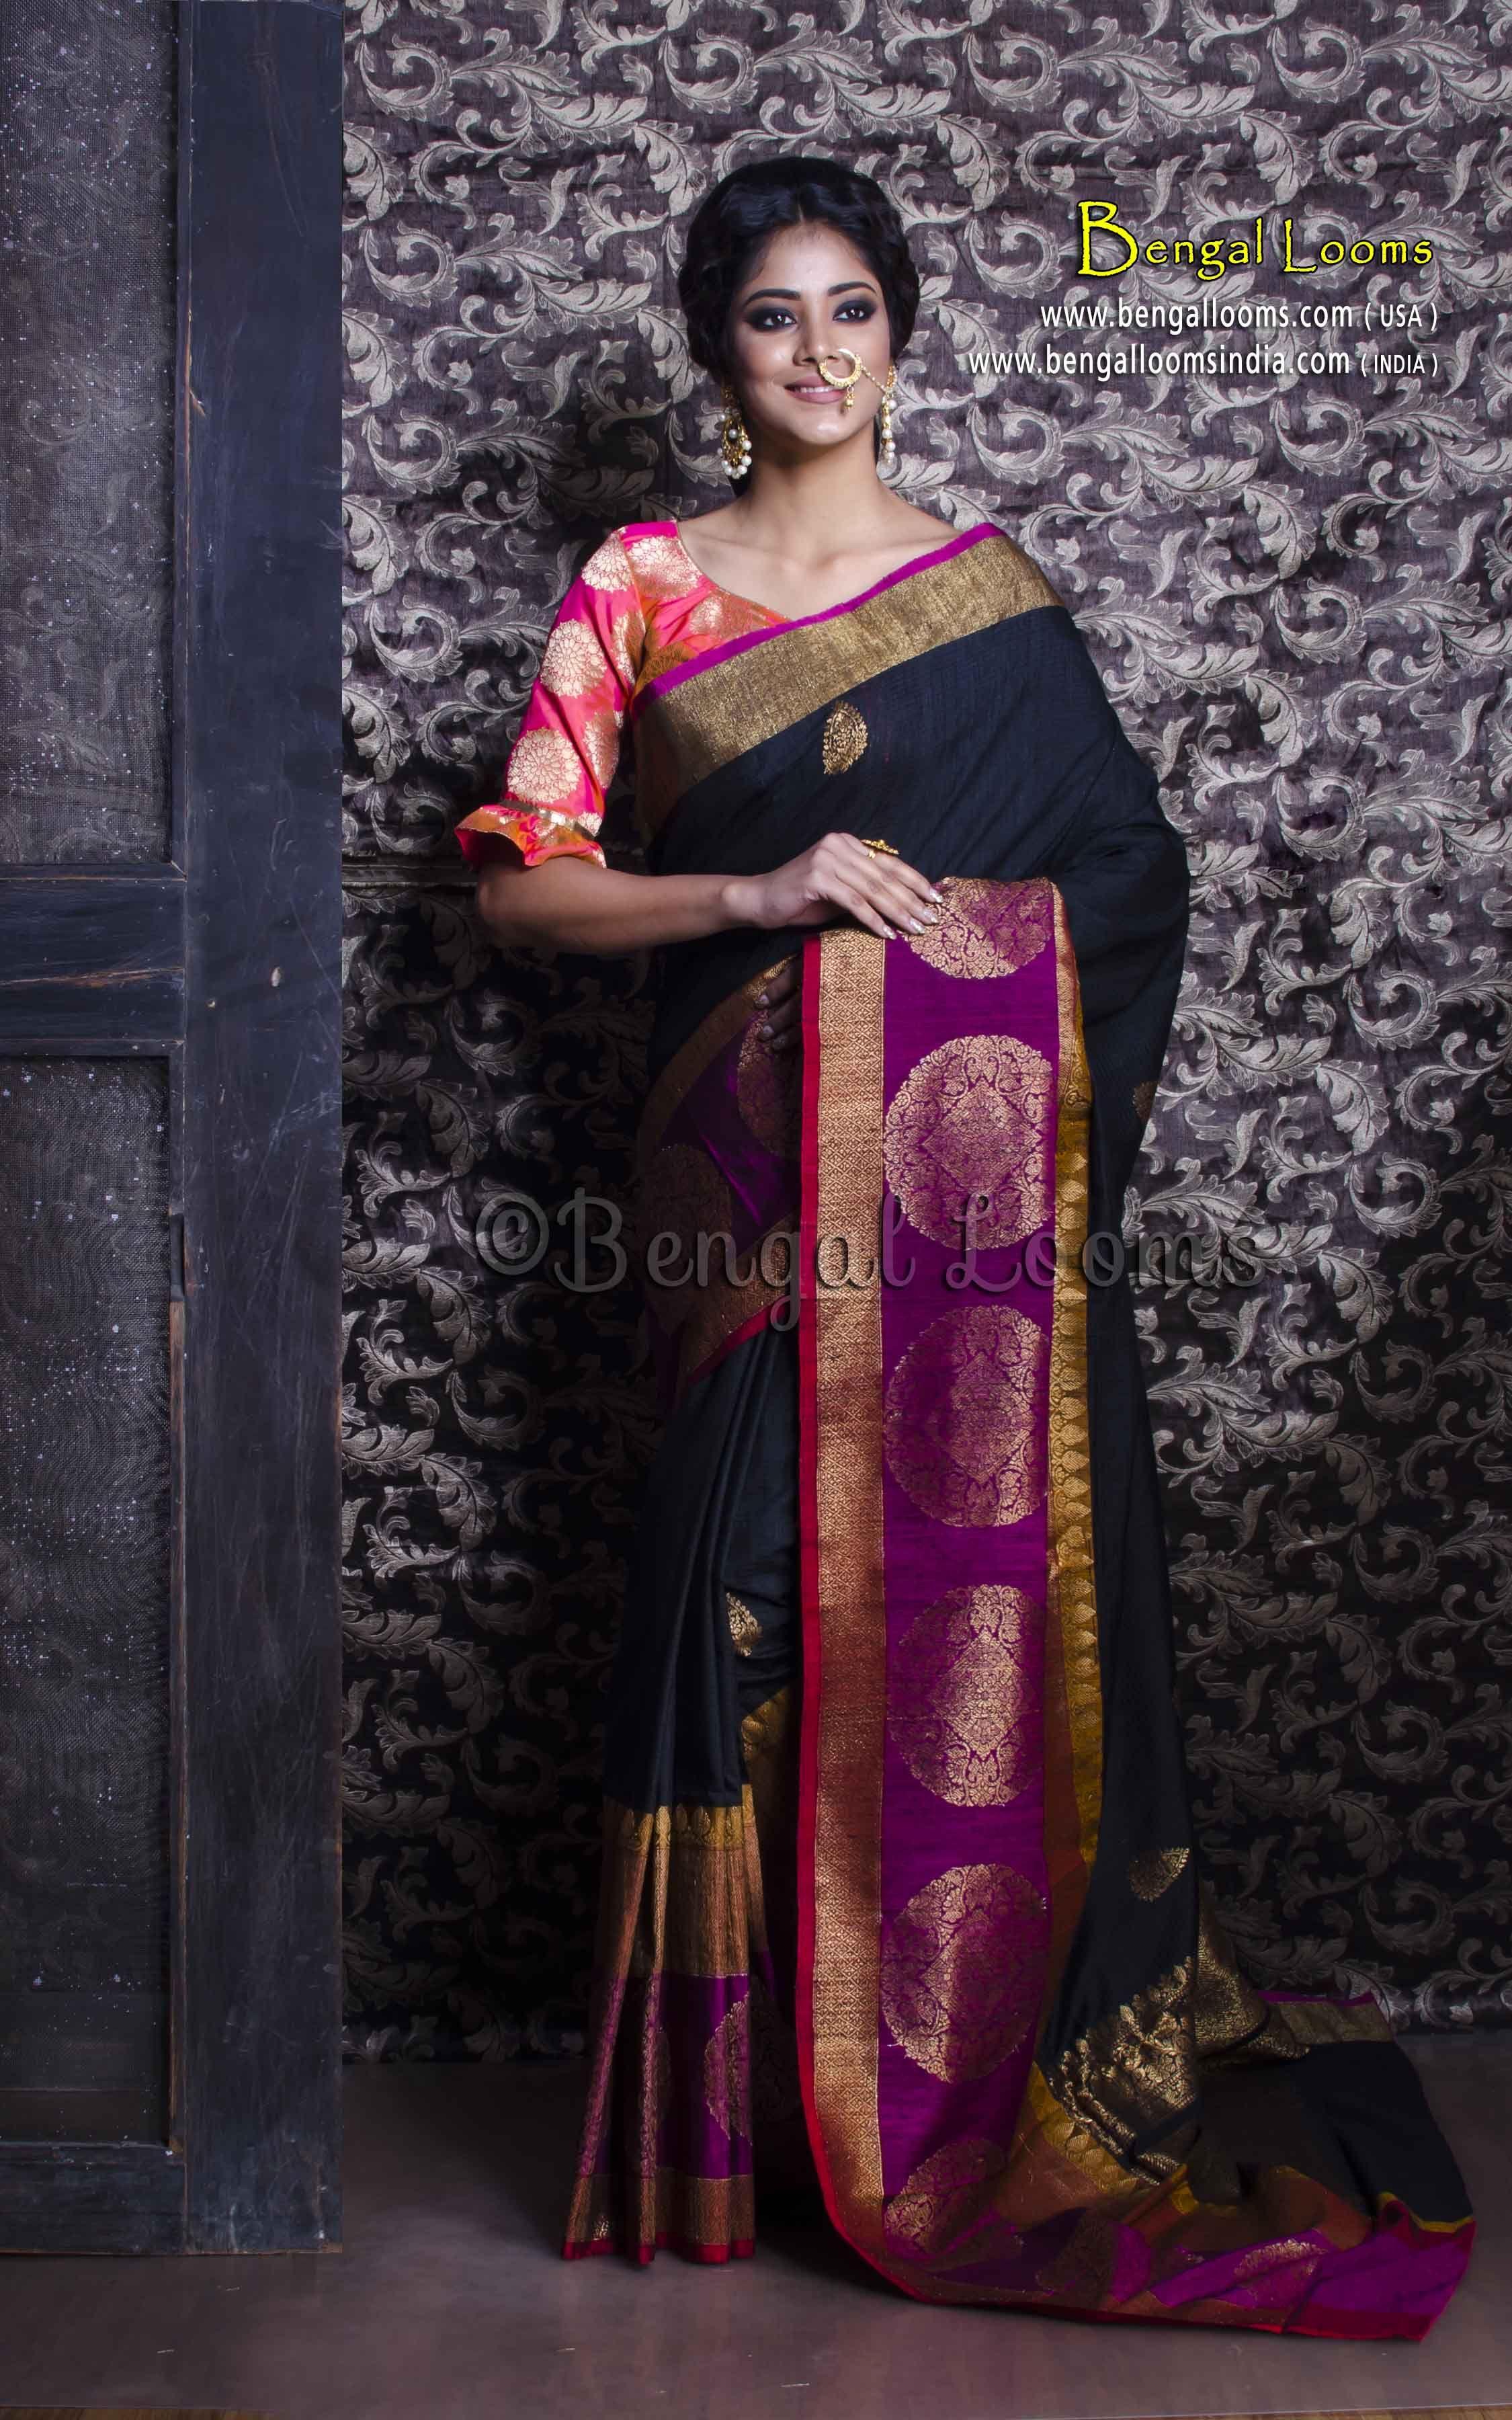 c47a9cf500 Pure Handloom Tussar Banarasi Saree in Black and Purple | Indian ...